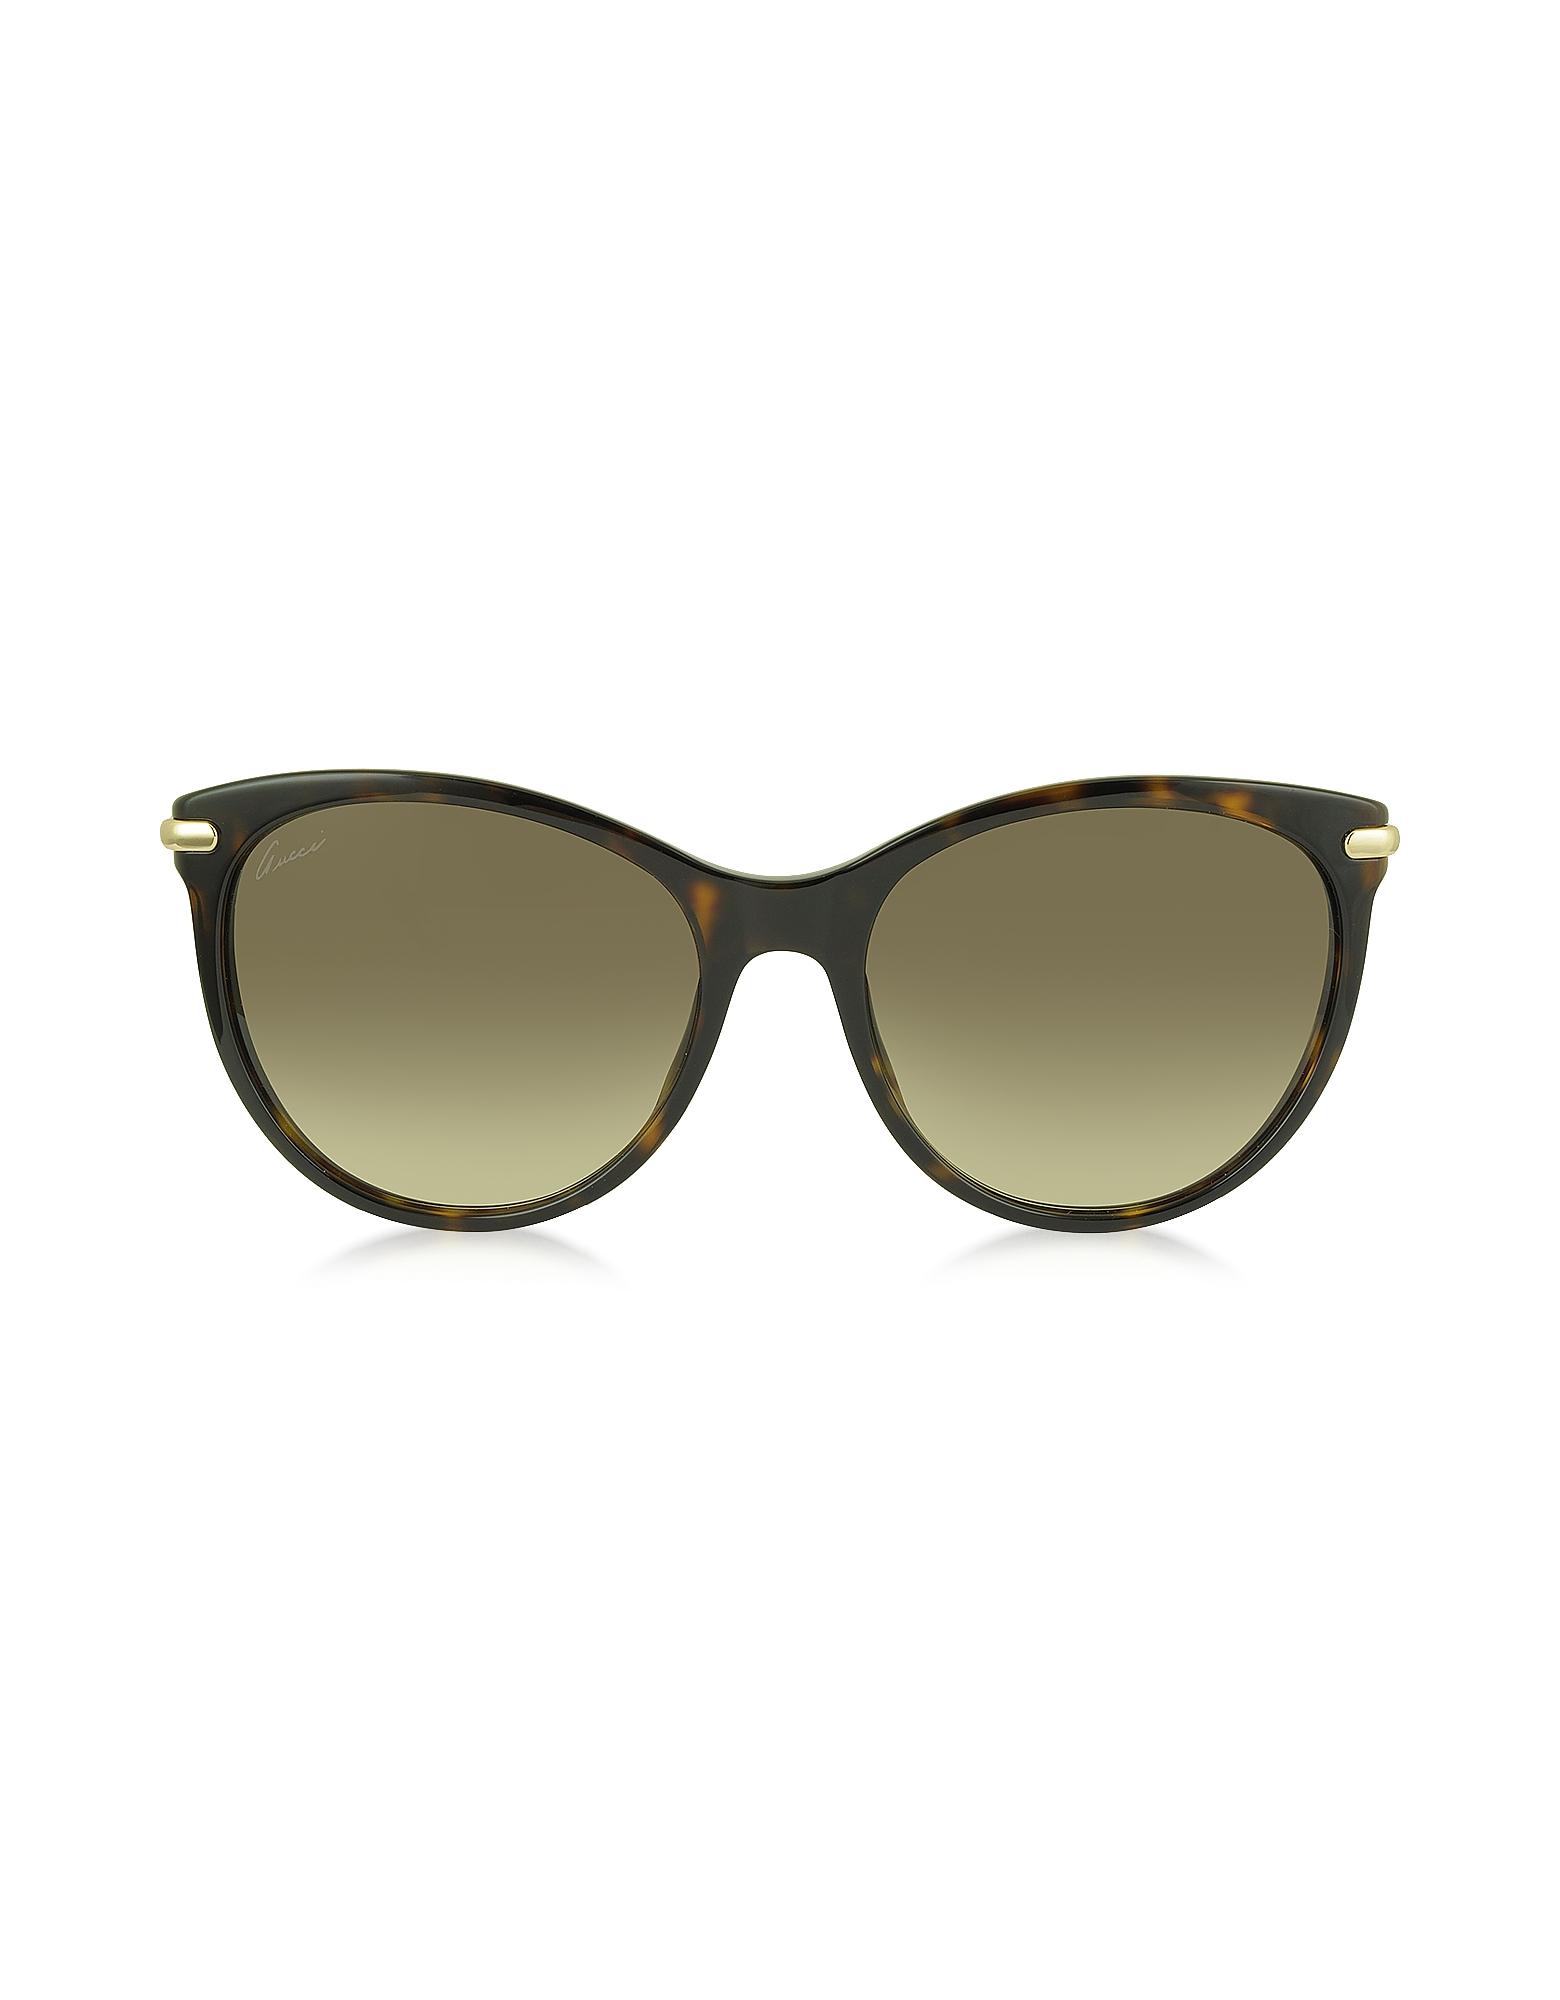 Gucci GG 3771/S LVLCC - Женские Солнечные Очки в Оправе Кошачий Глаз из Ацетата Гавана с Бамбуковыми Дужками